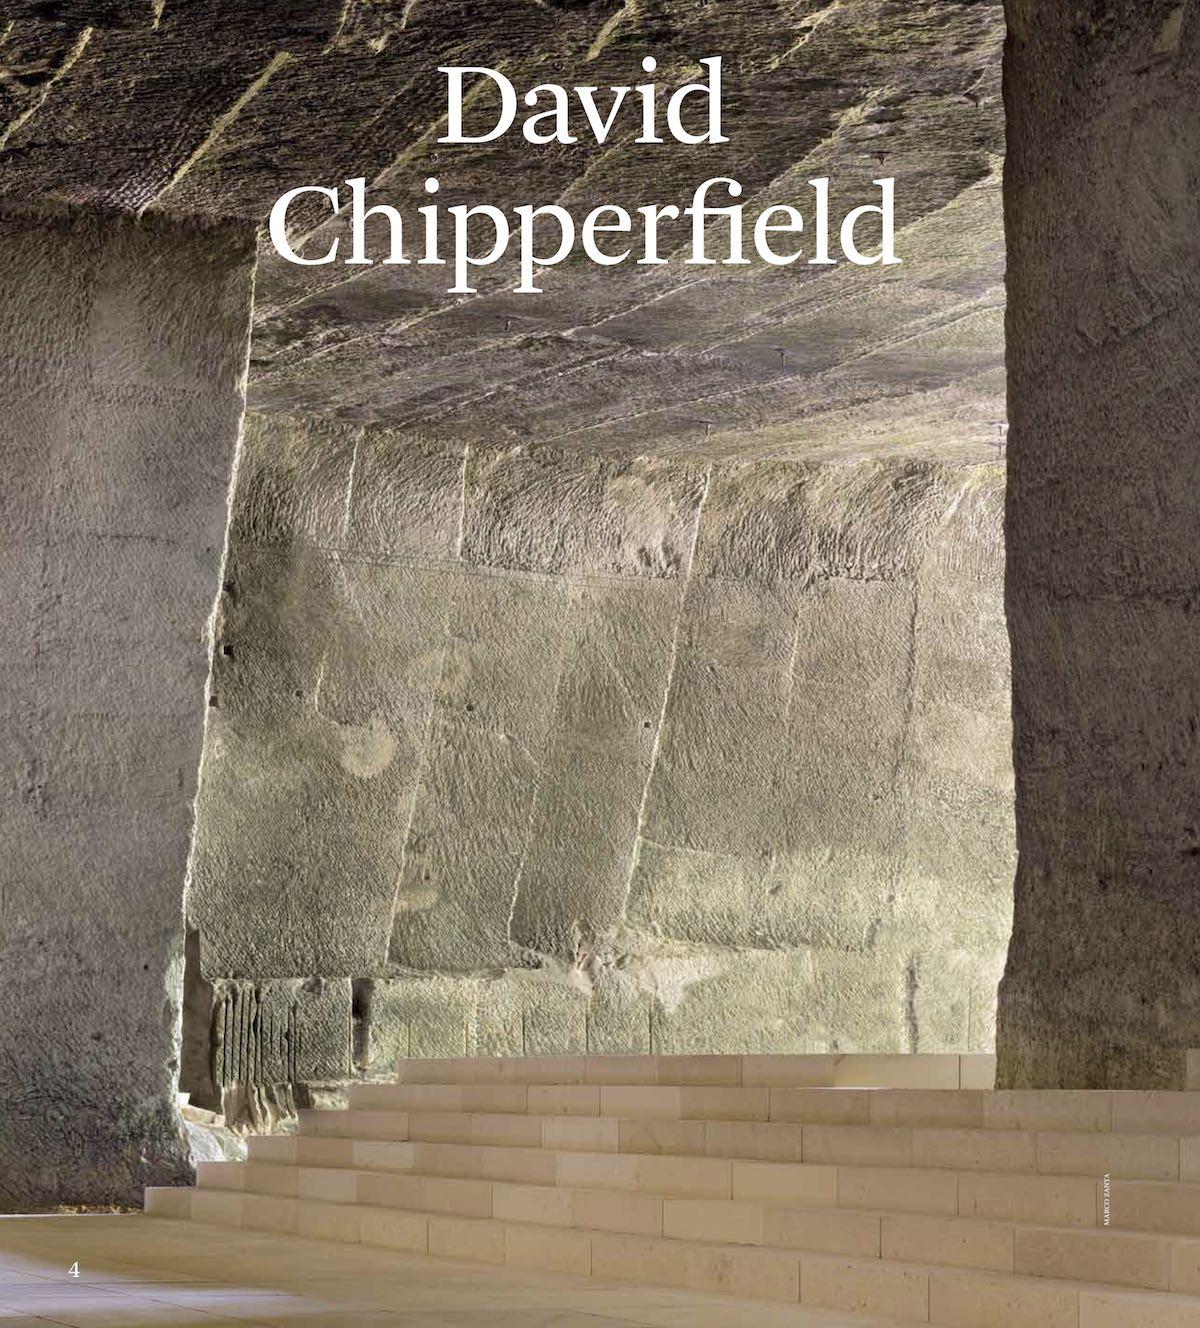 886 CHIPPERFIELD